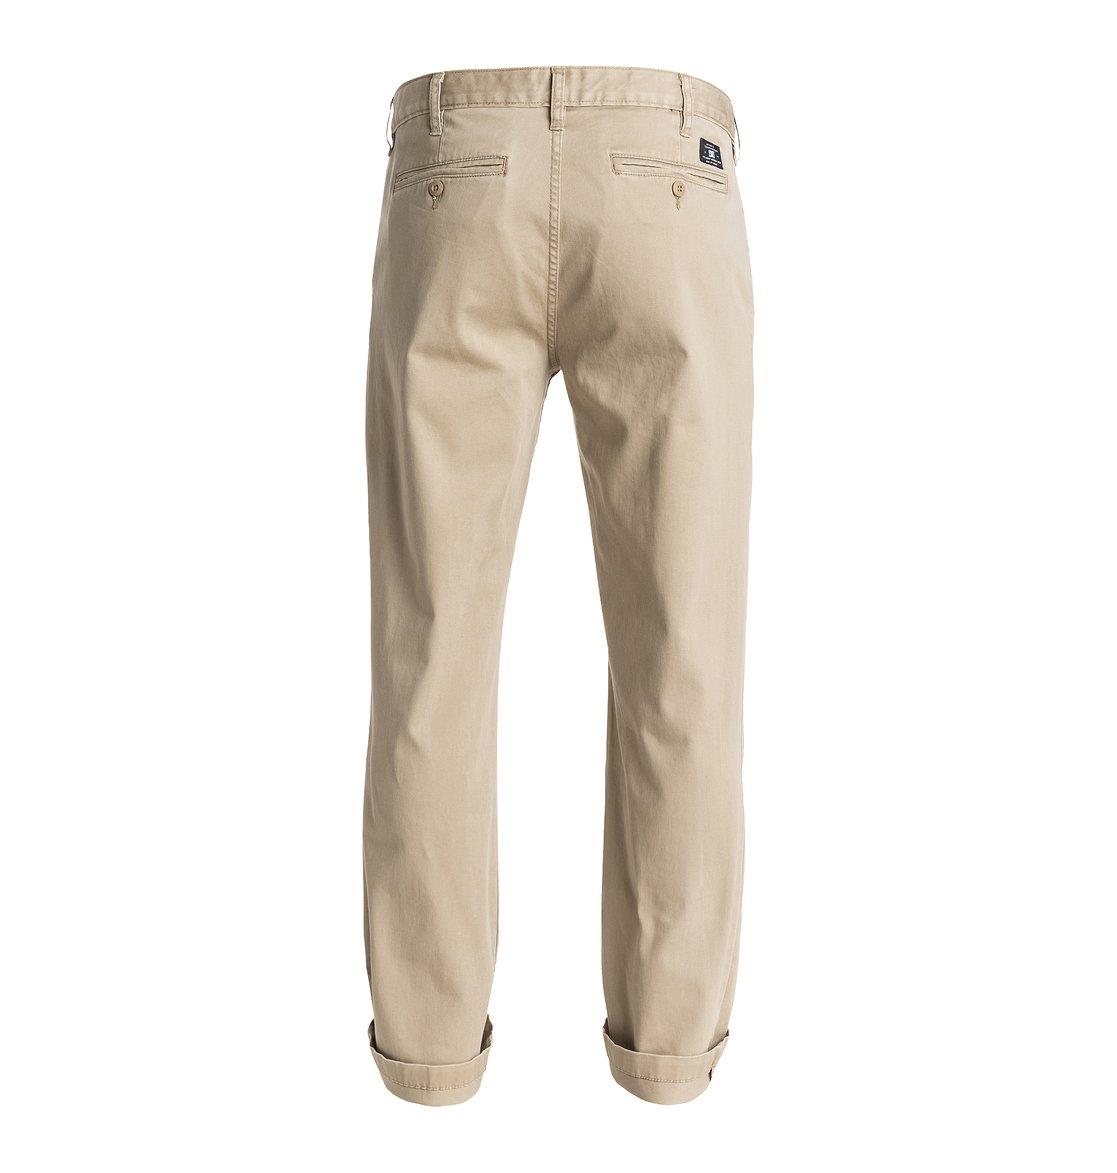 6b27e1f13 3 Men's Worker Straight Fit Chino 32